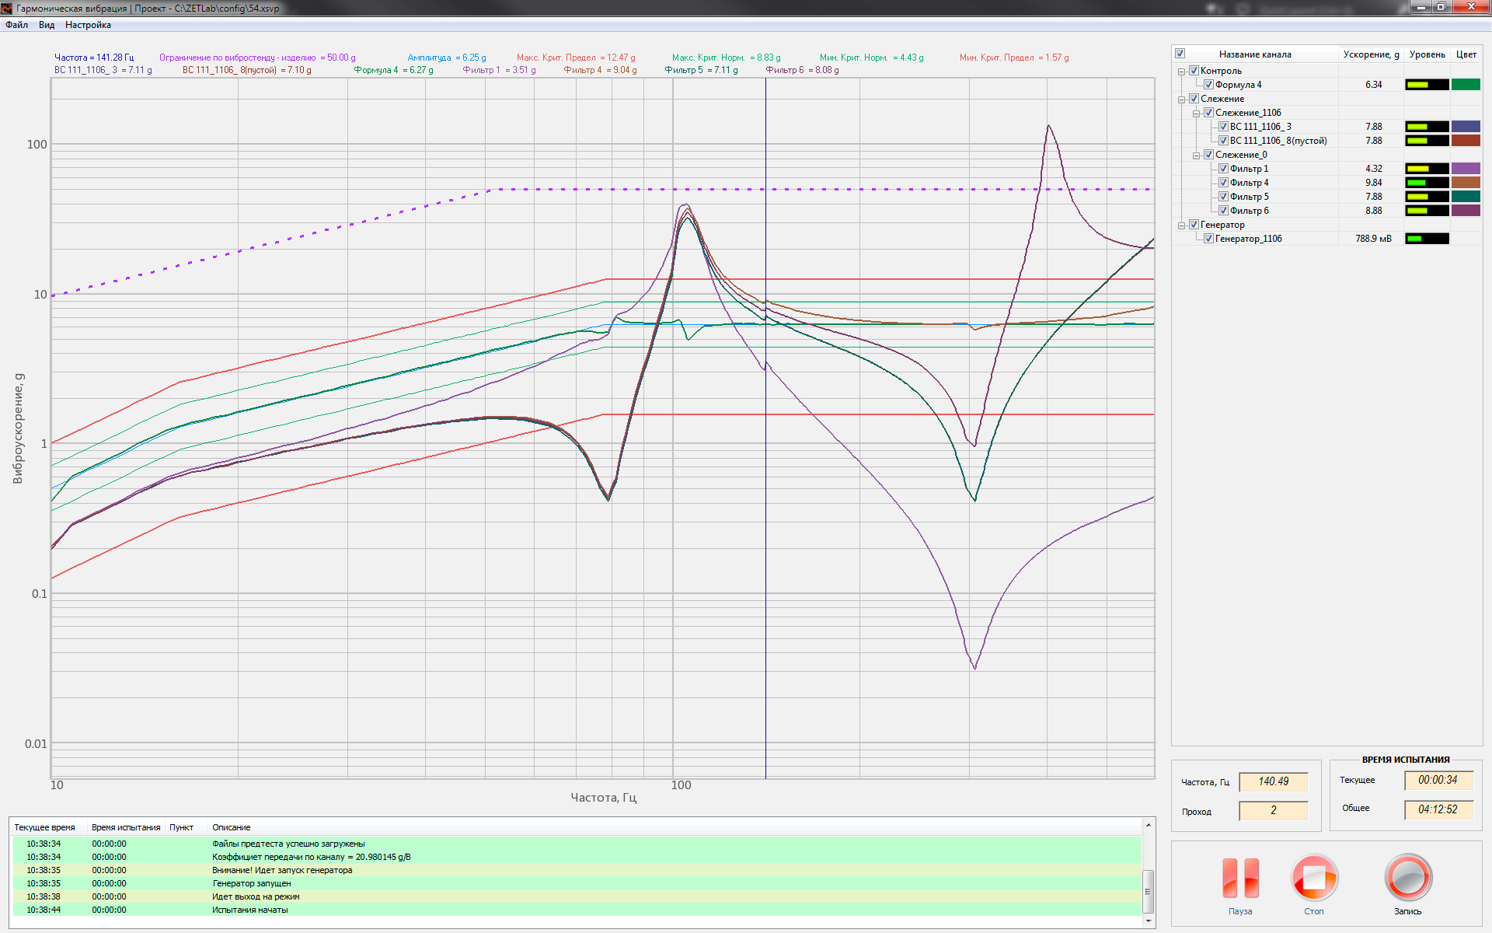 Harmonic vibration - interface of the program